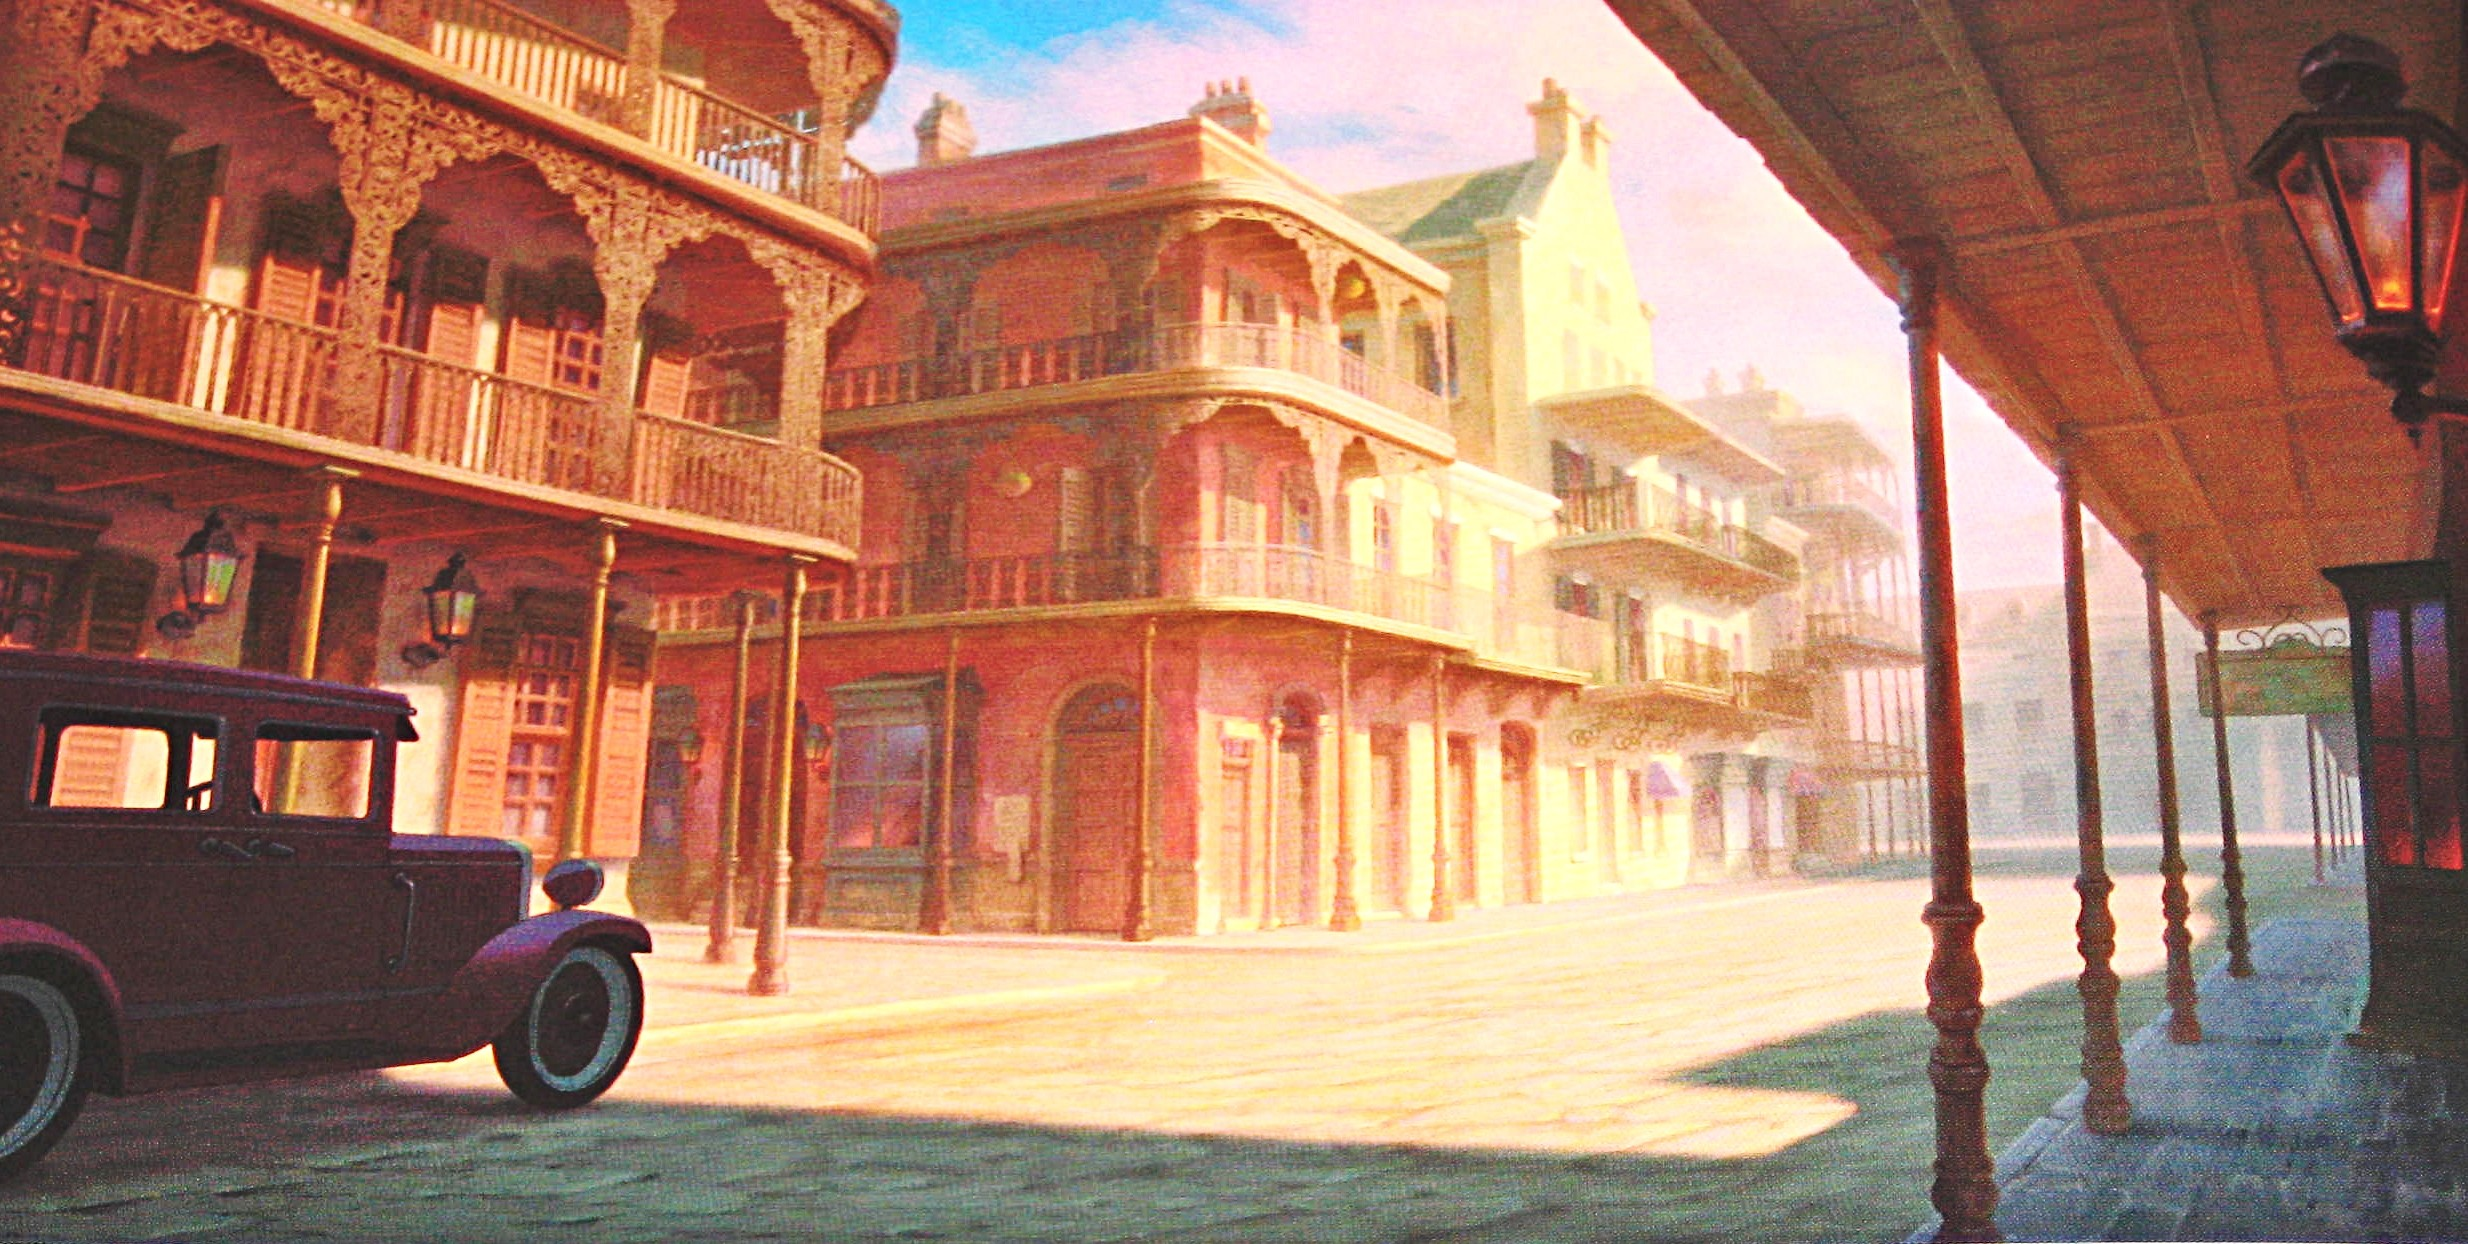 Walt-Disney-Backgrounds-The-Princess-and-the-Frog-walt-disney-characters-28107907-2468-1244.jpg  (2468×1244) | REFS – Background | Pinterest | Frog wallpaper …